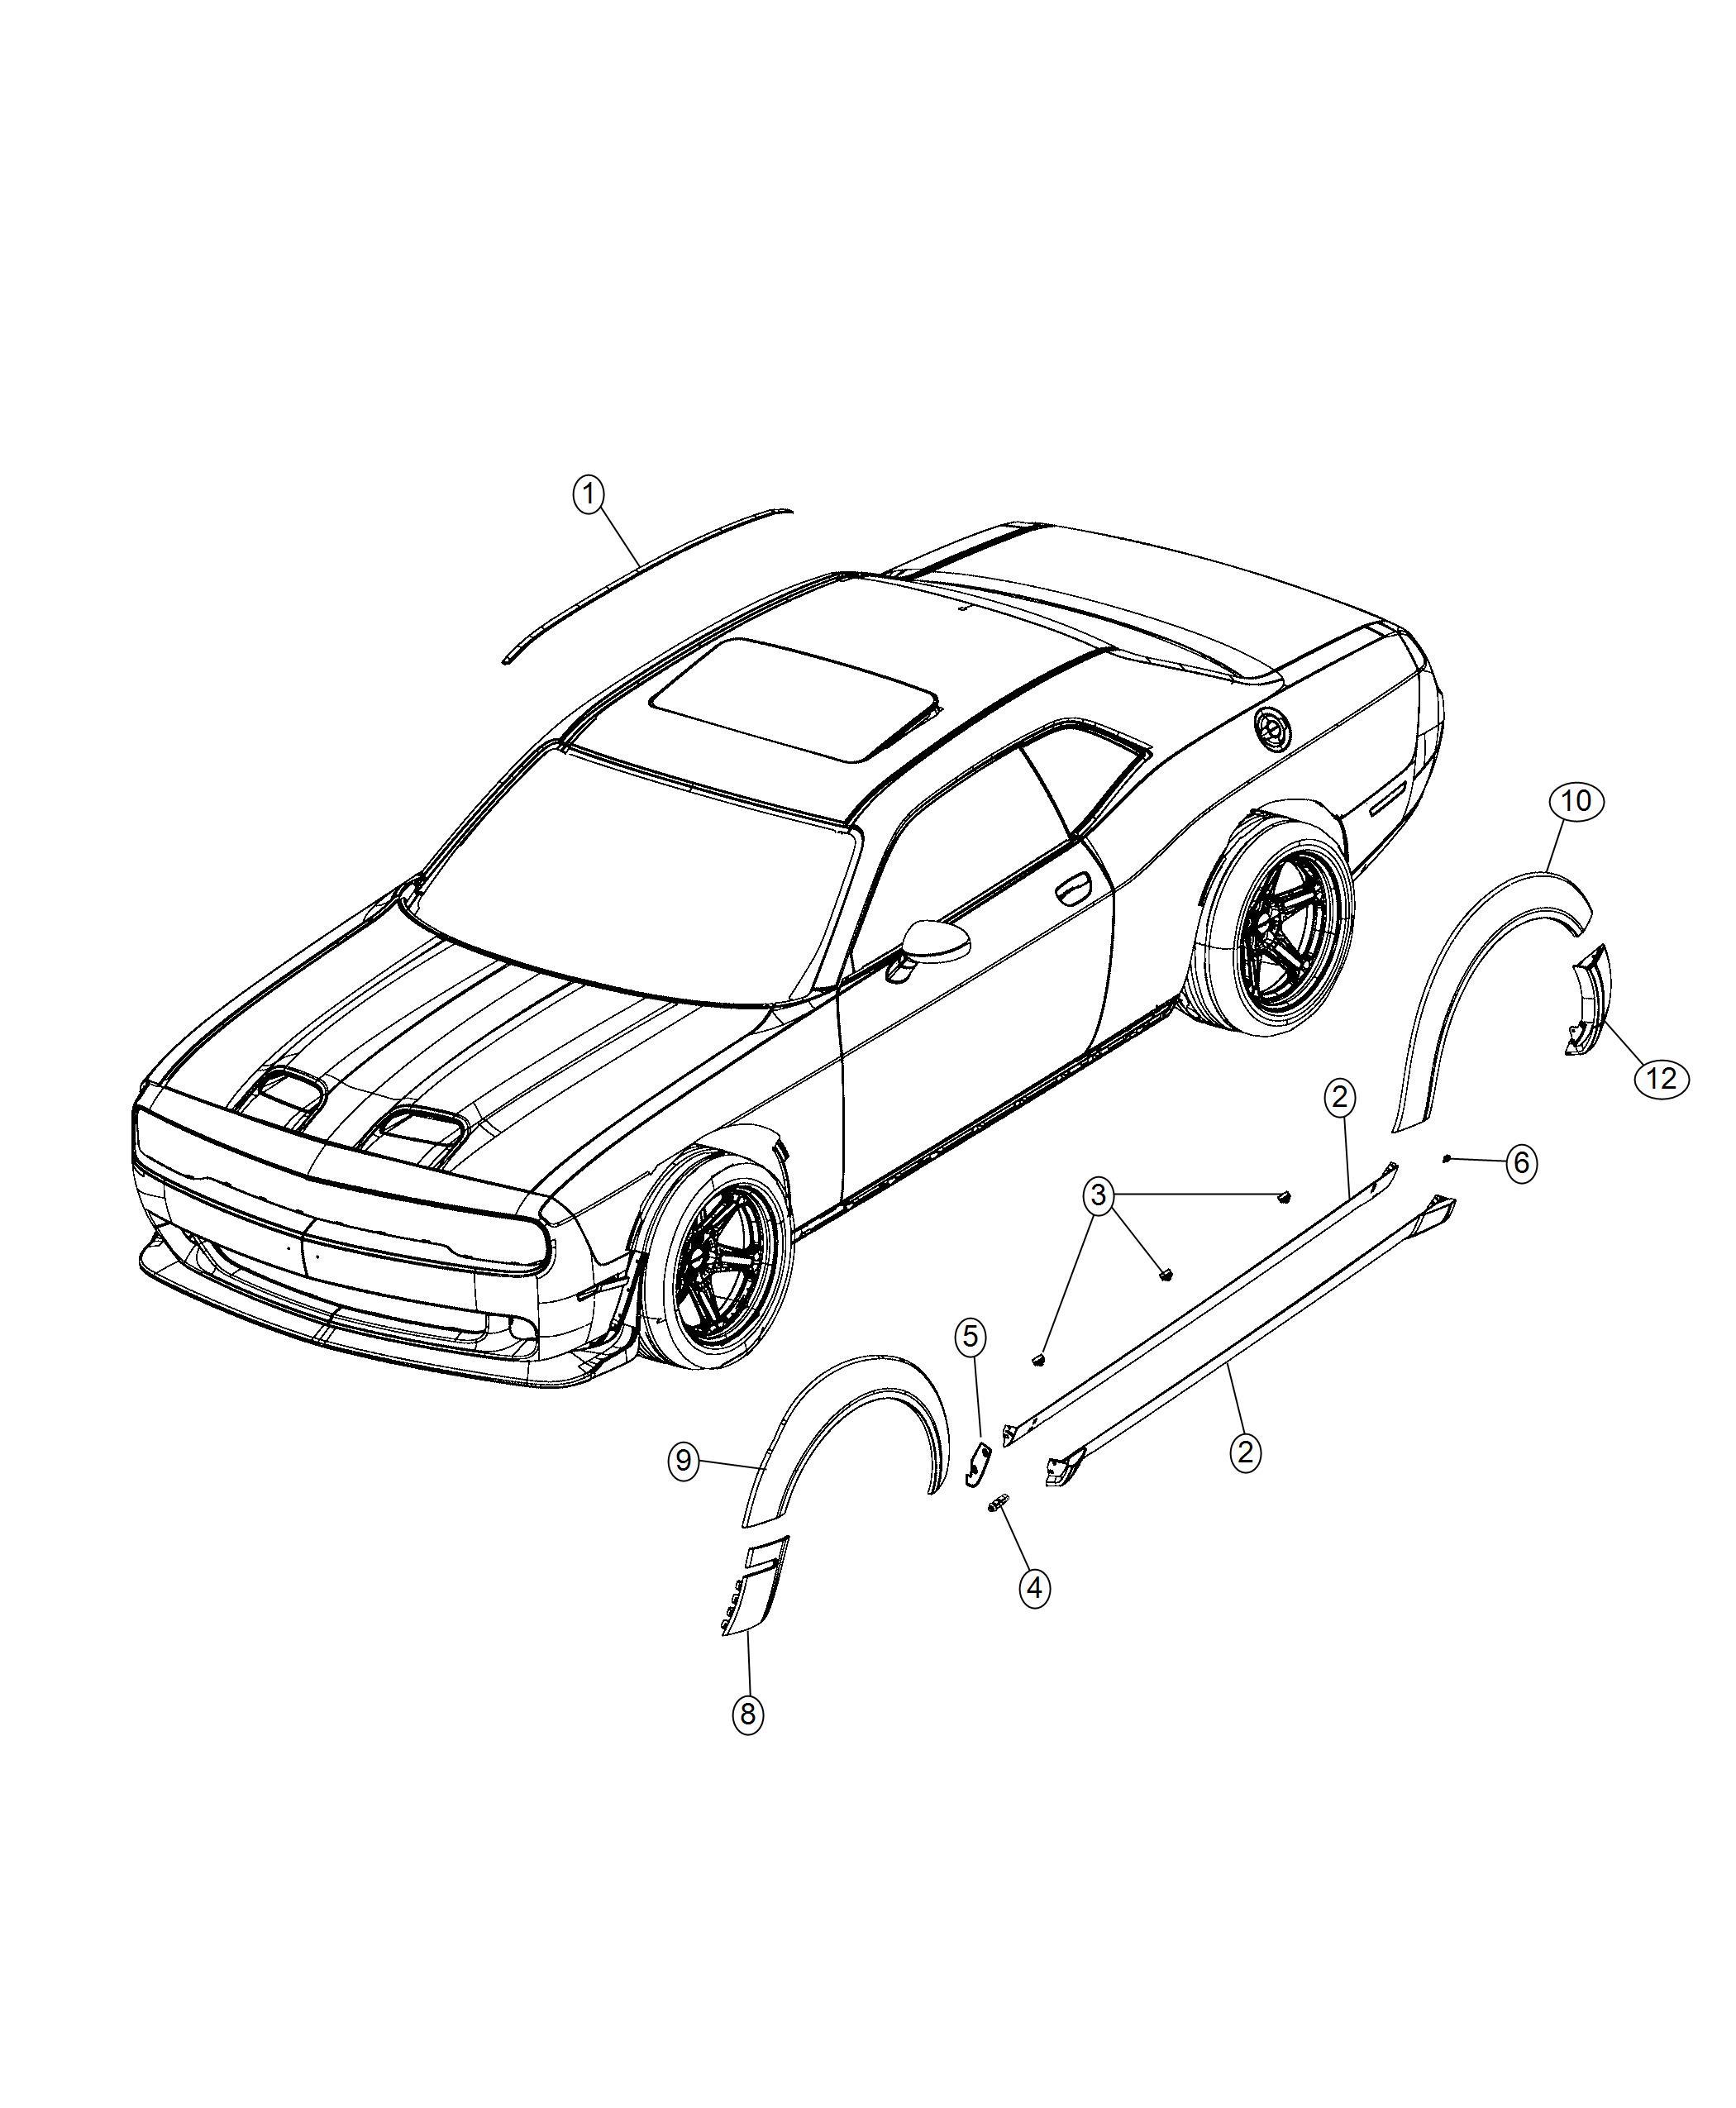 Dodge Challenger Molding Wheel Opening Flare Rear